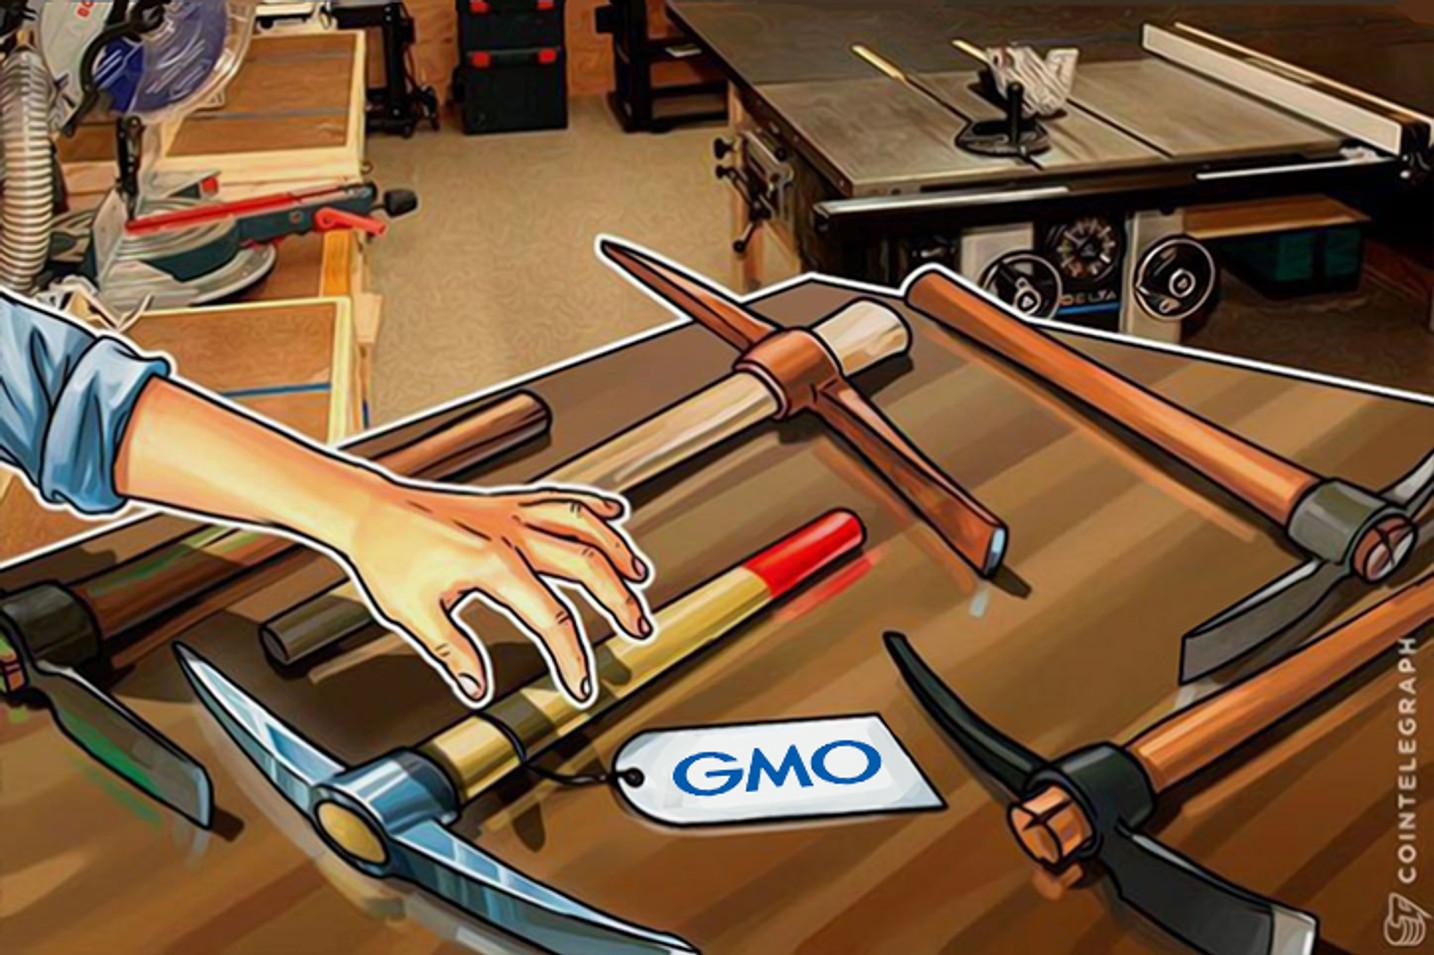 GMOがマイニングマシンの販売開始、価格は約22万円で10月末から出荷